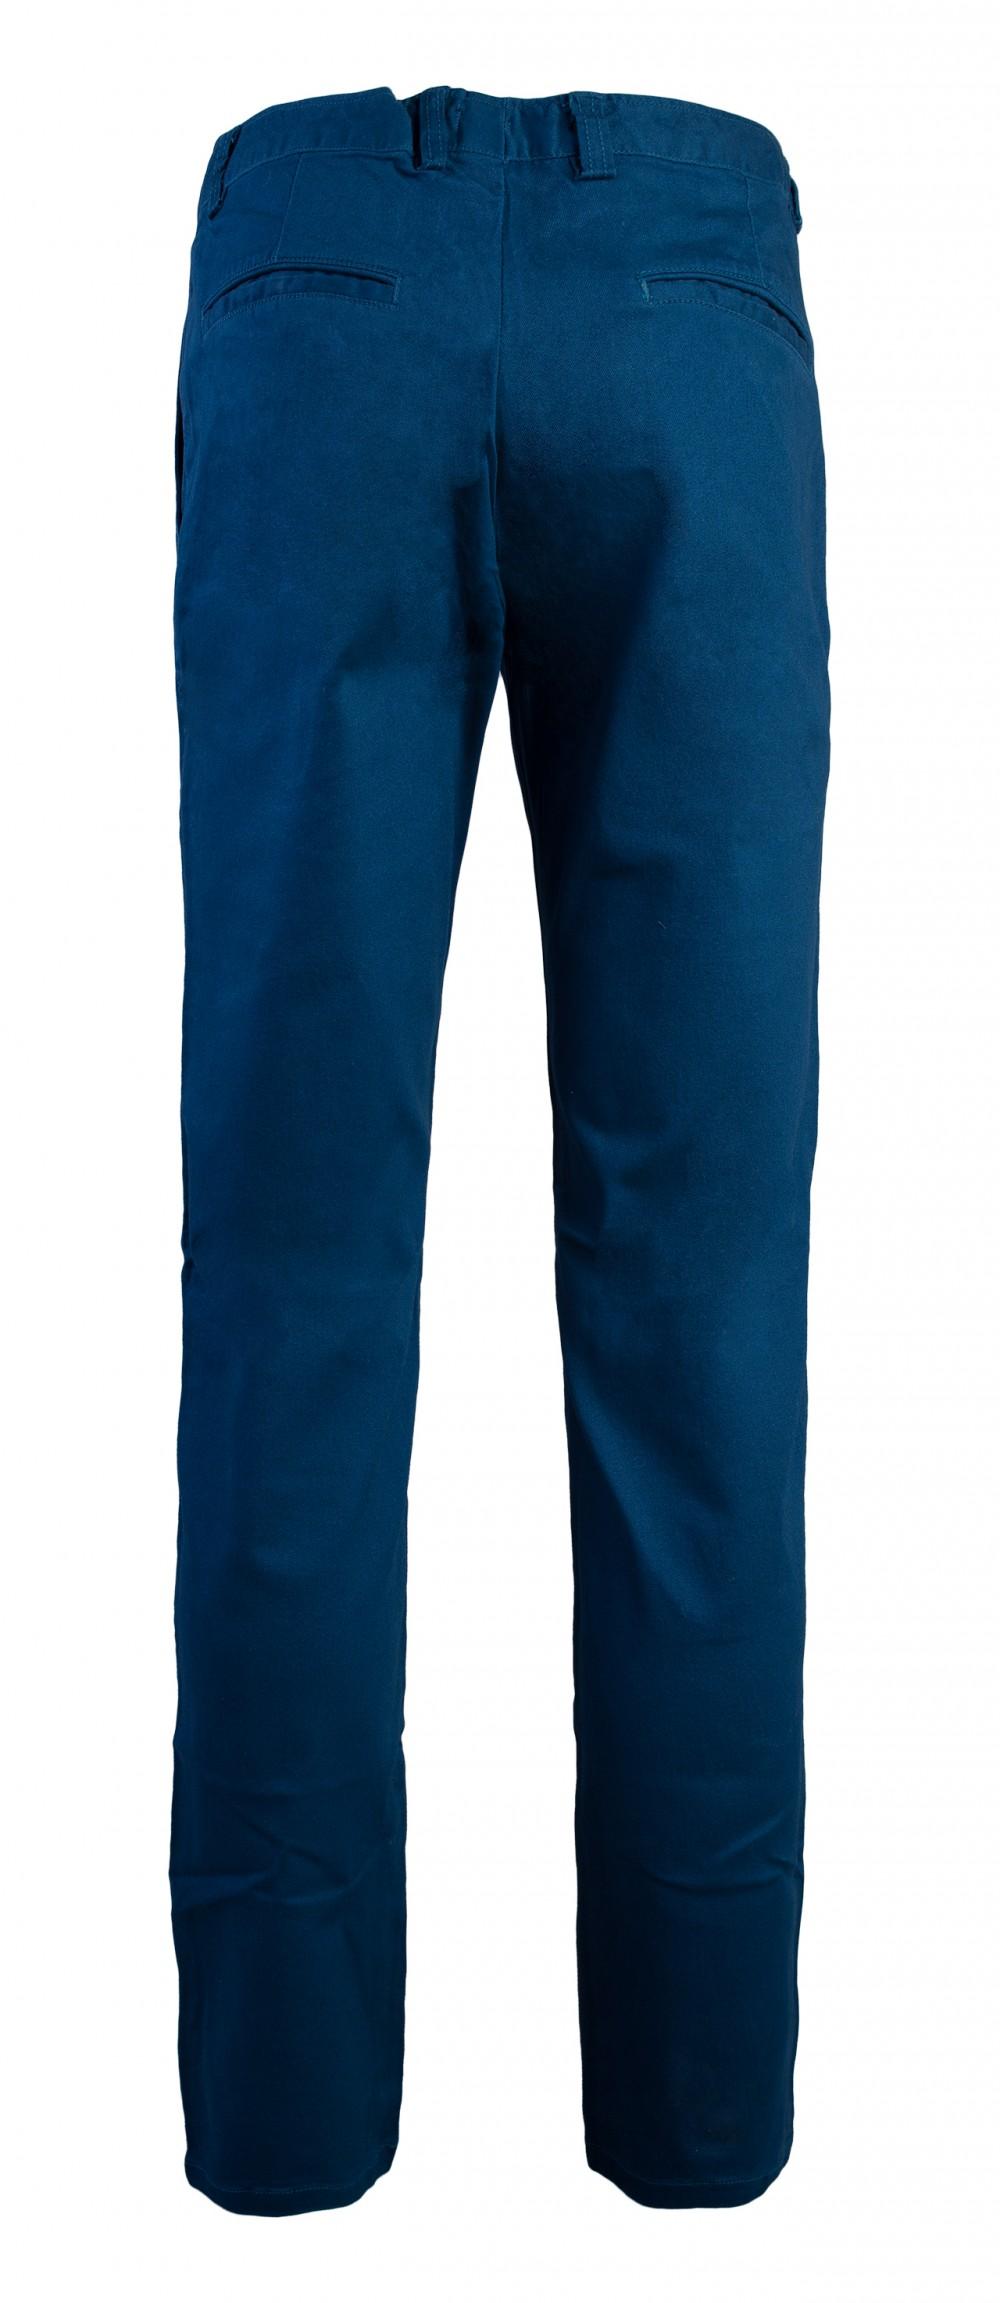 Quần kaki xanh cổ vịt qk167 - 3